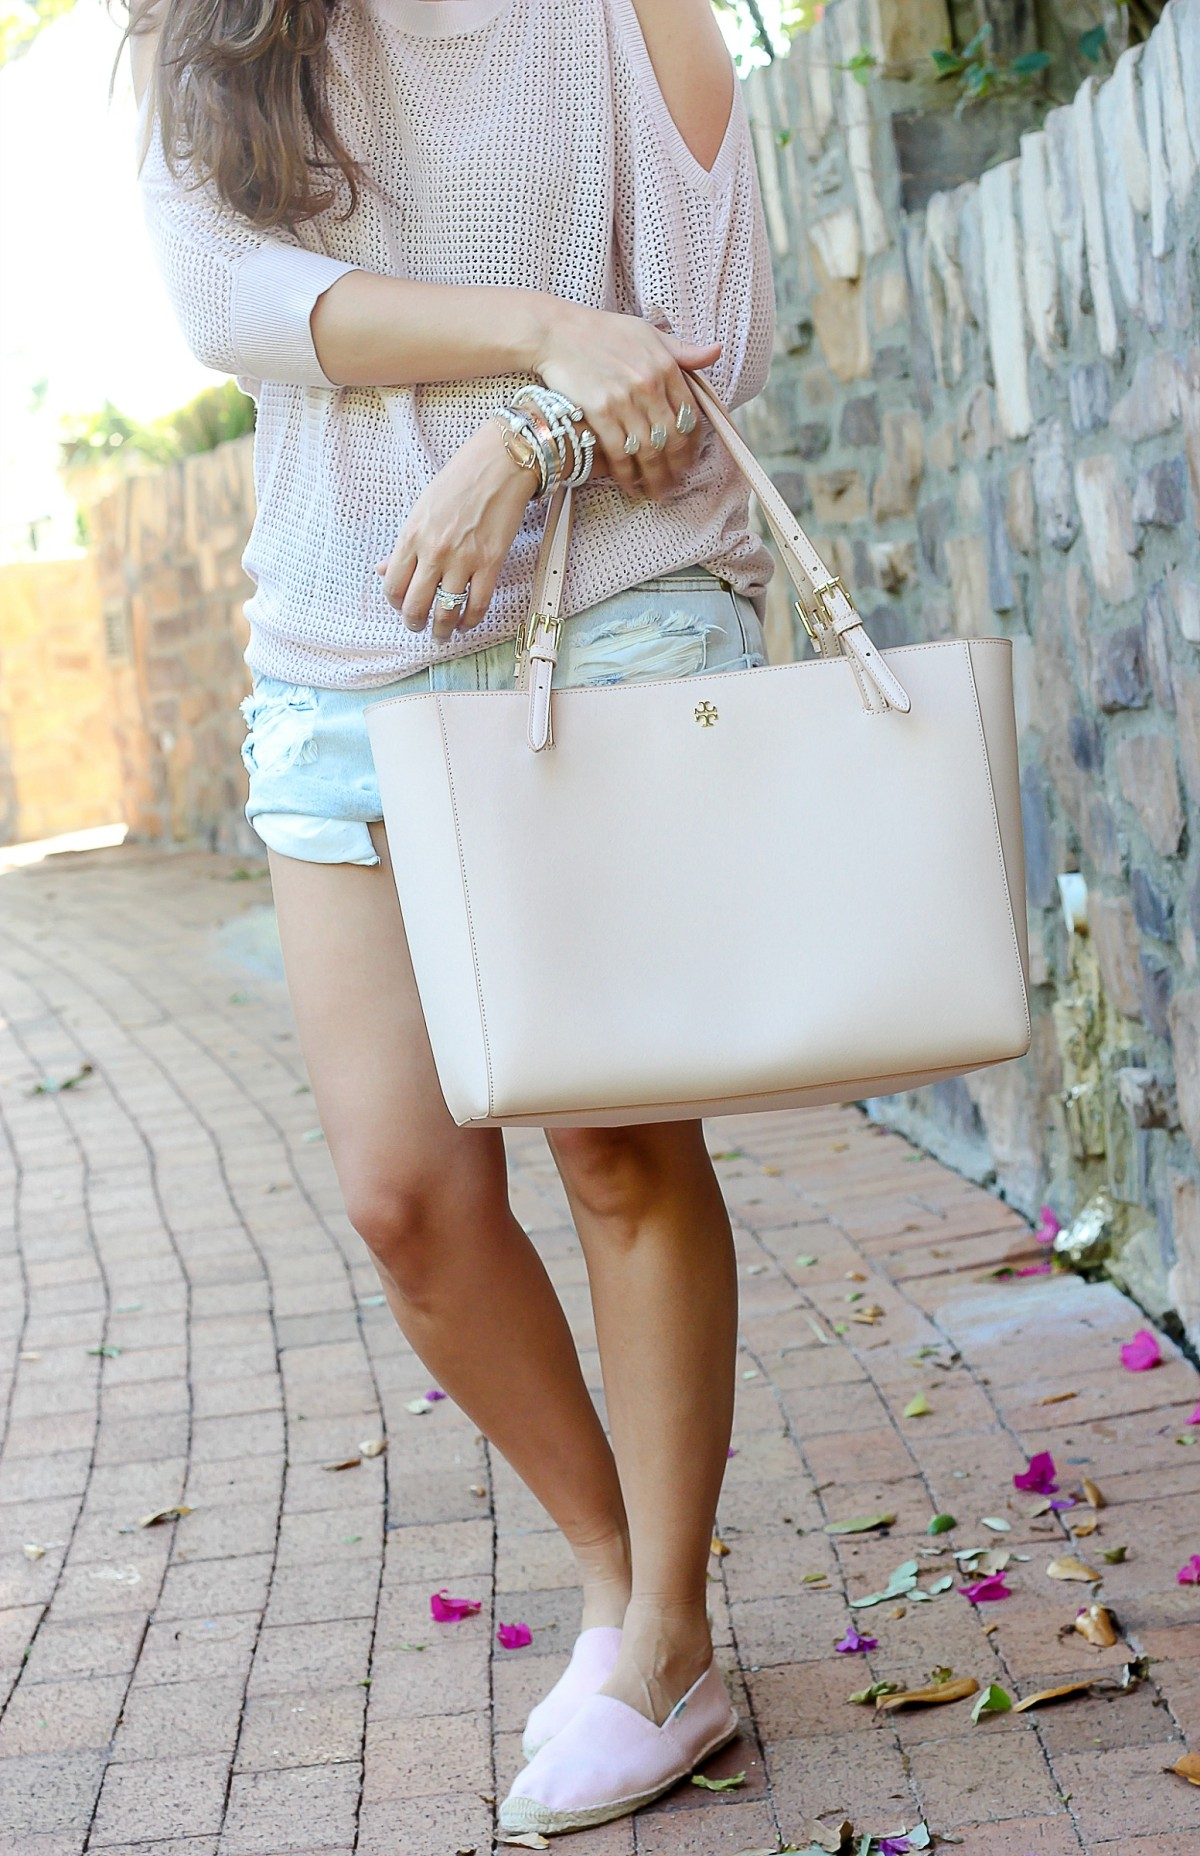 best blush  bag, tory burch tote, Jaime Cittadino